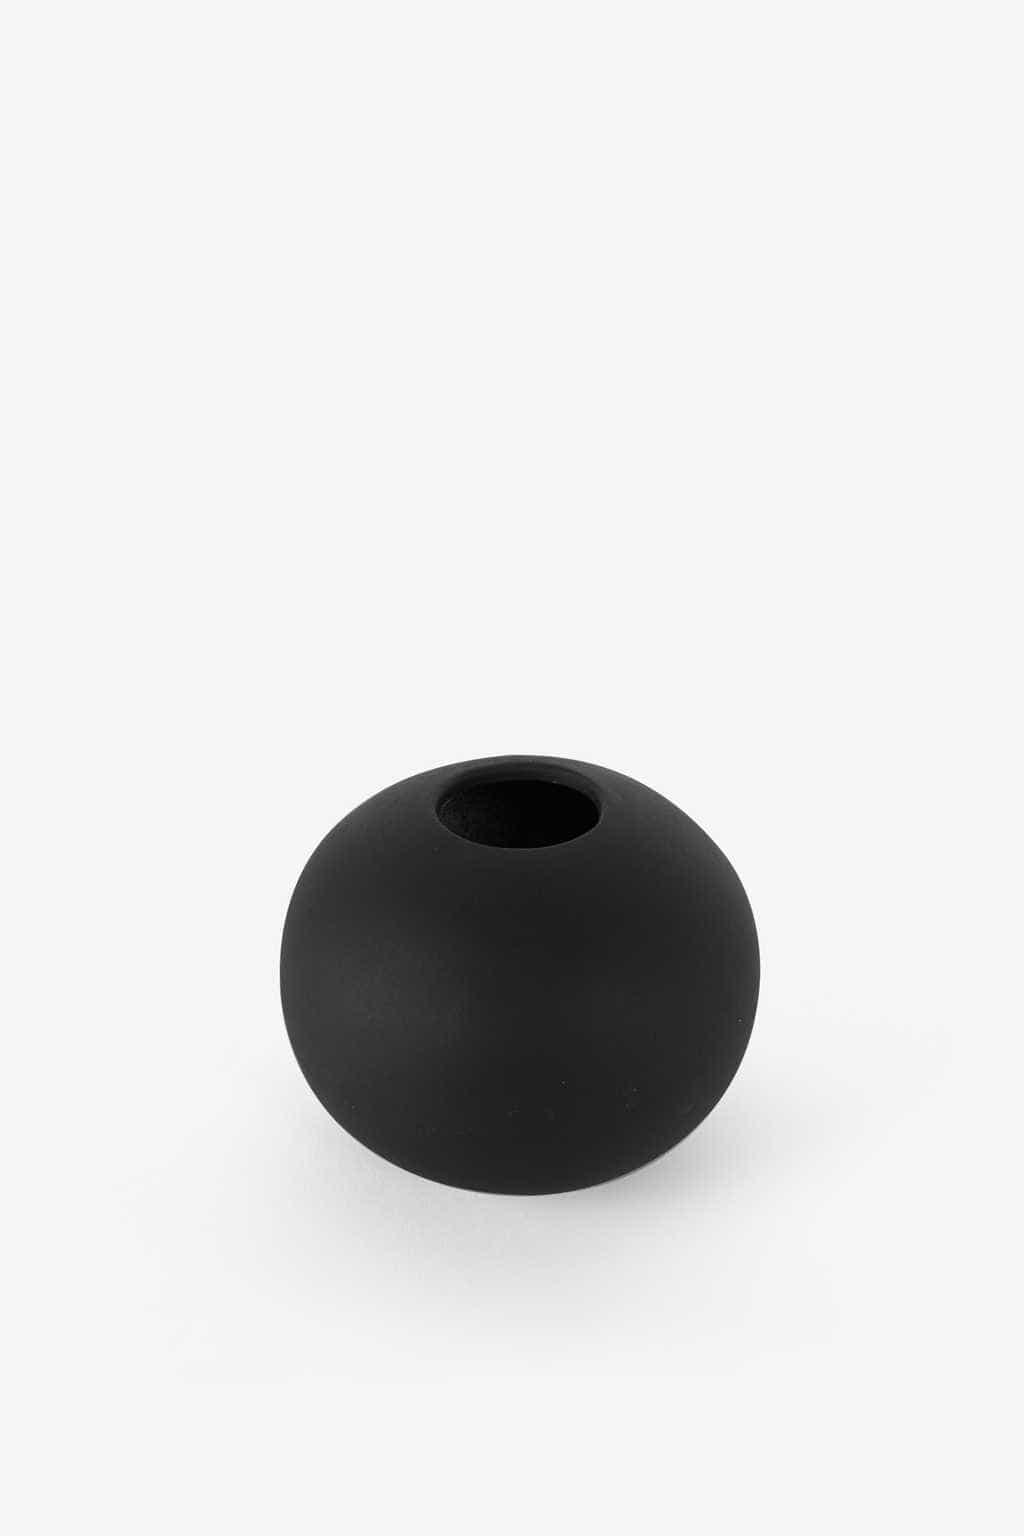 Rounded Vase 3132 Black 9